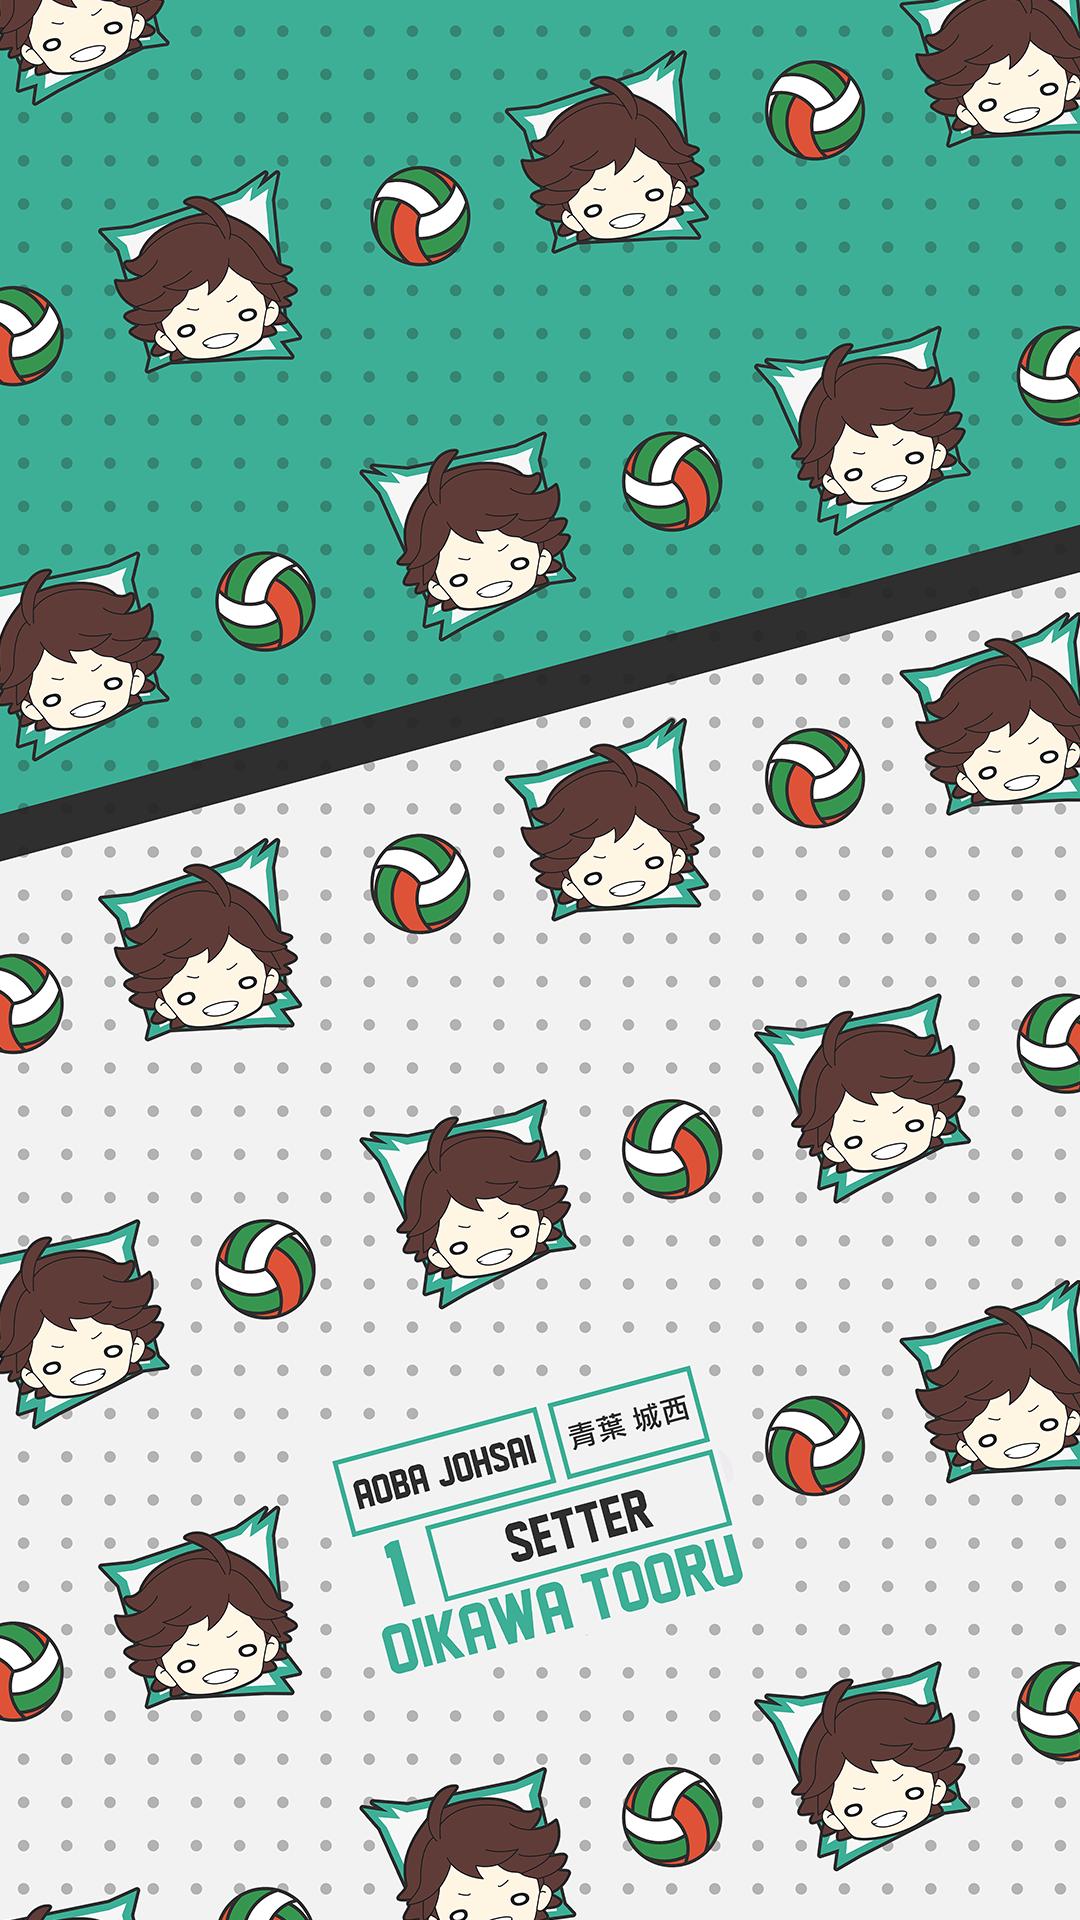 Oikawa Tooru Aoba Johsai Pattern Haikyuu Wallpaper In 2020 Haikyuu Wallpaper Haikyuu Anime Cute Anime Wallpaper